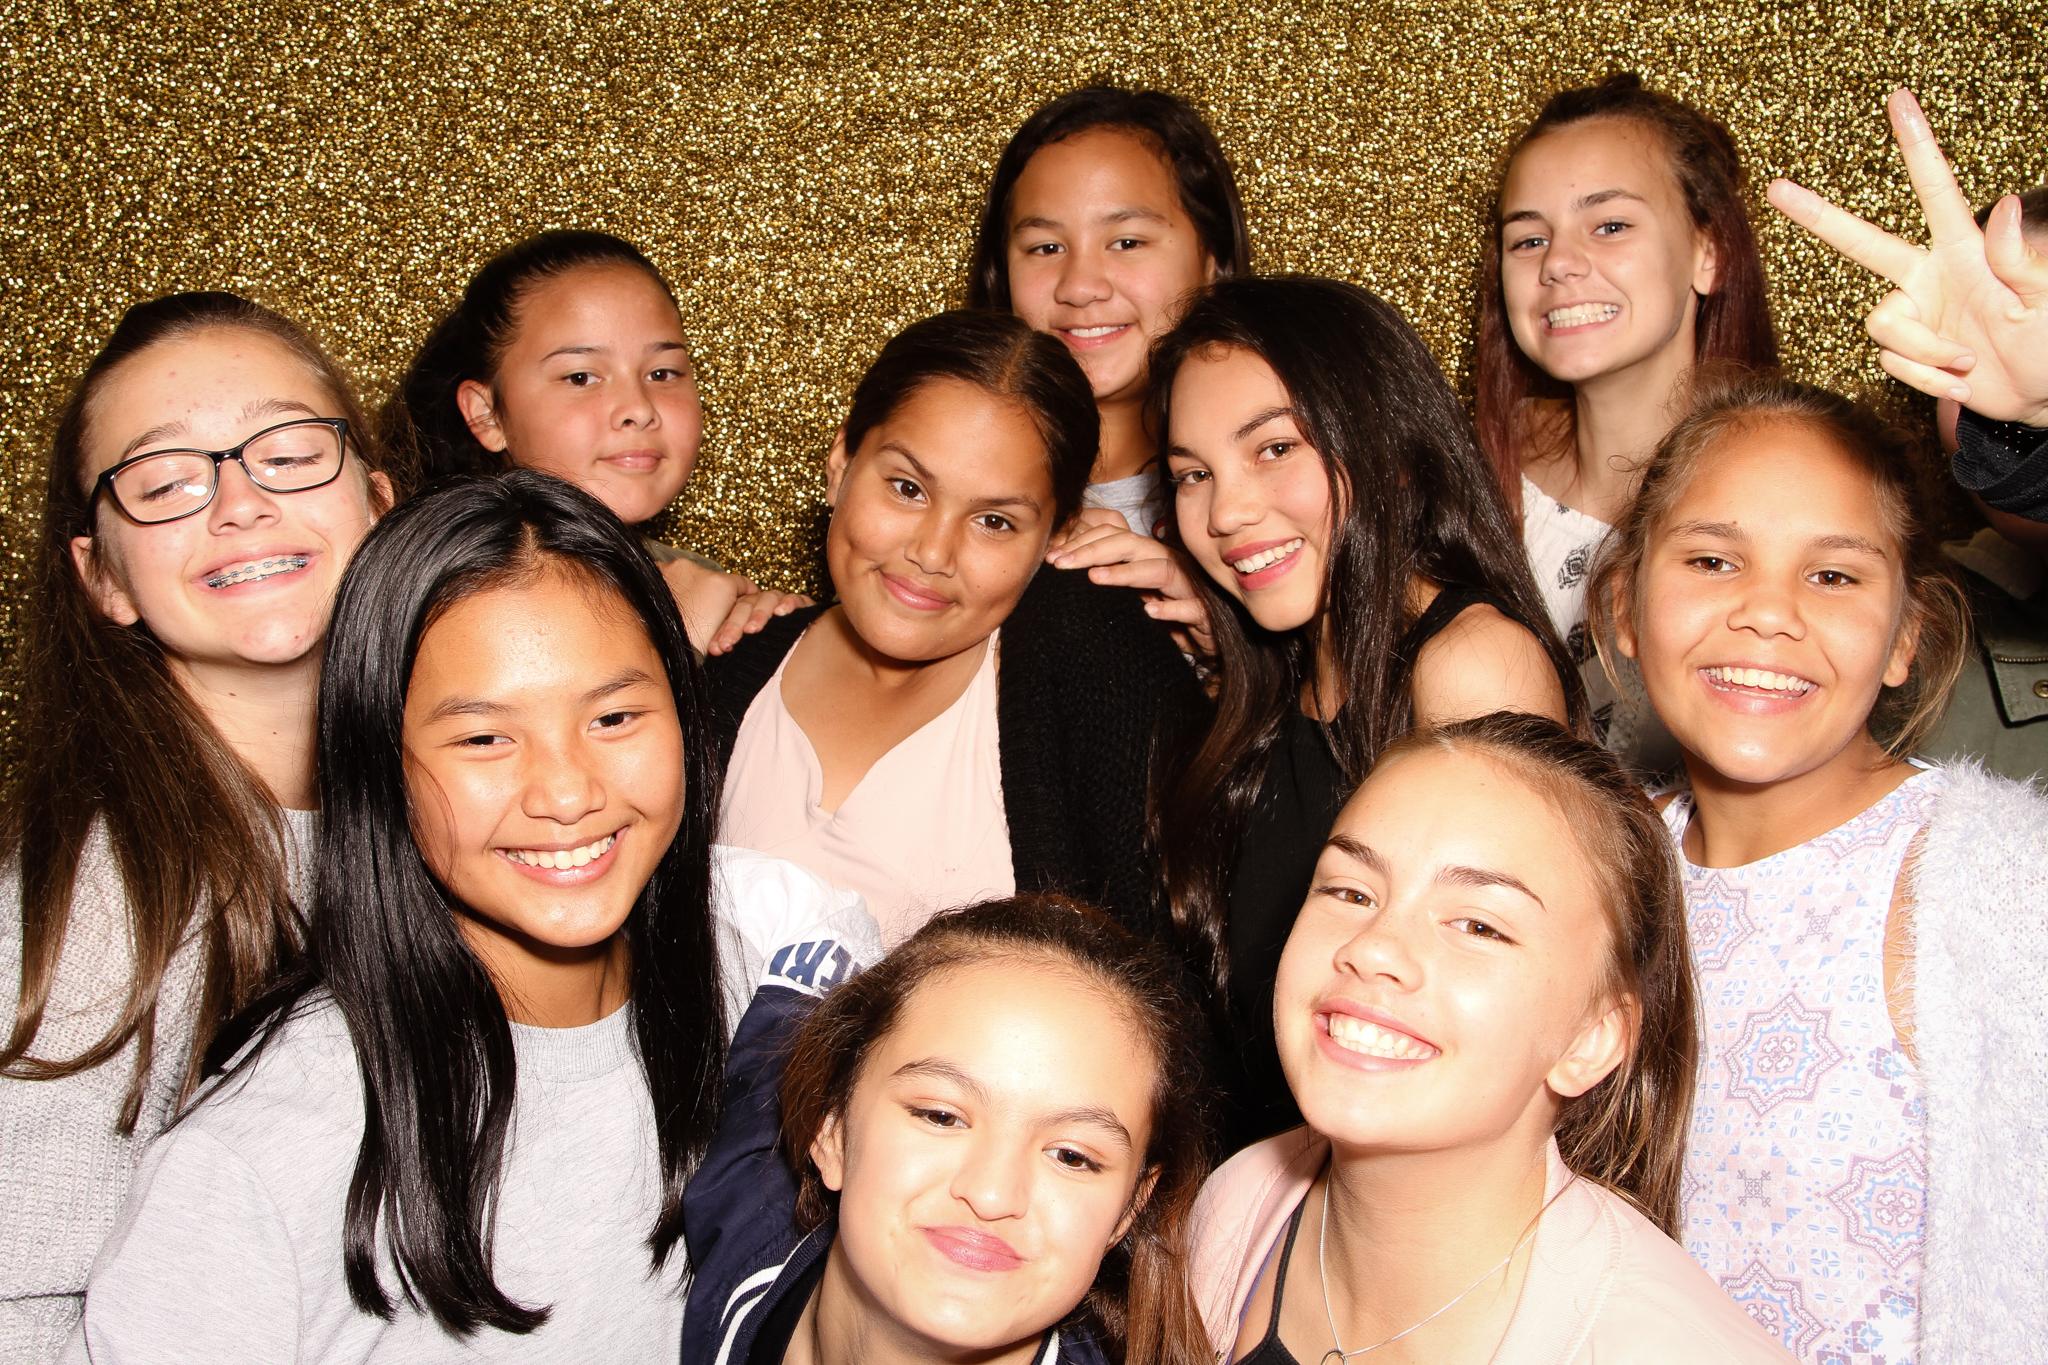 Jessicas 13th Birthday Photobooth